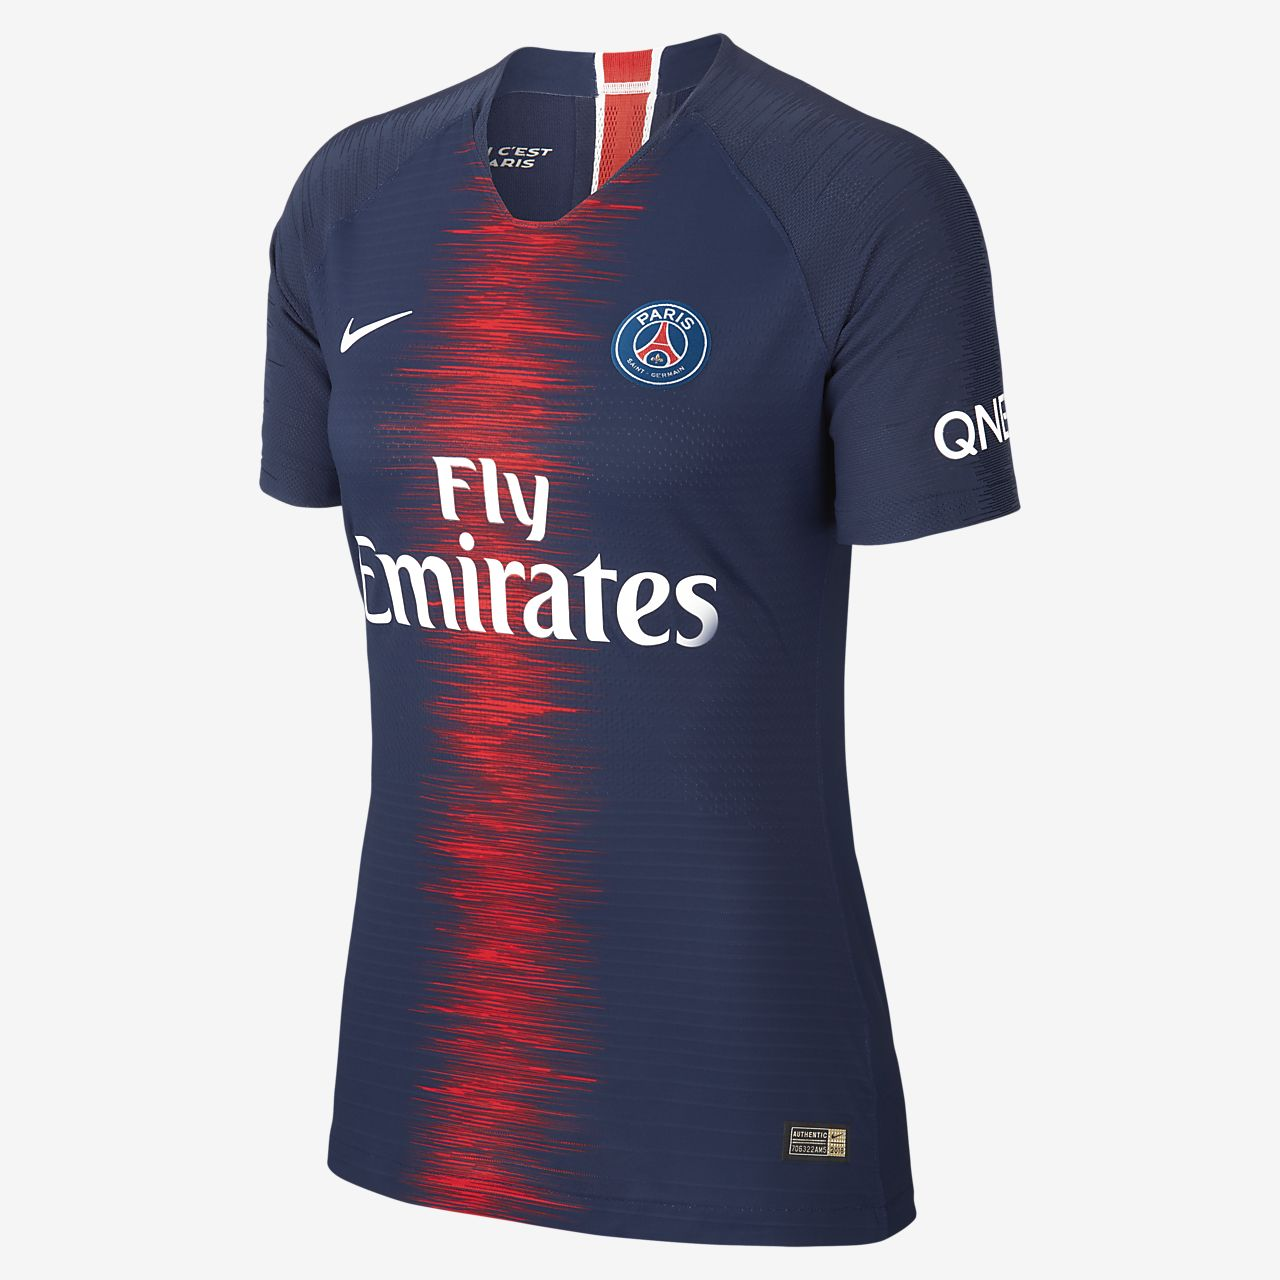 Camiseta de fútbol para mujer de local Vapor Match del Paris Saint-Germain 2018/19